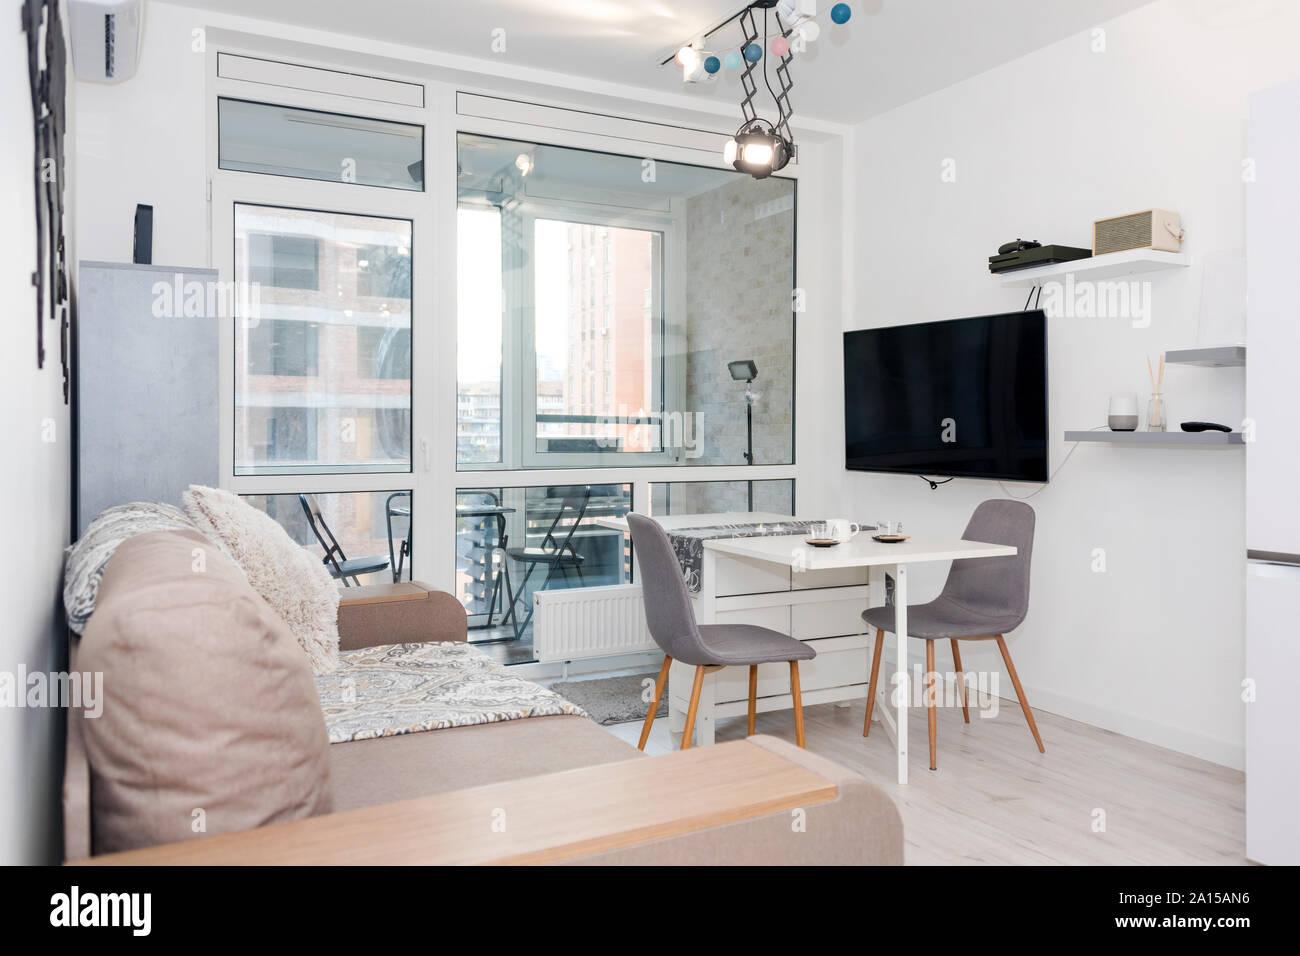 Minimalist Modern Living Room With Sofa In Light Minimalist